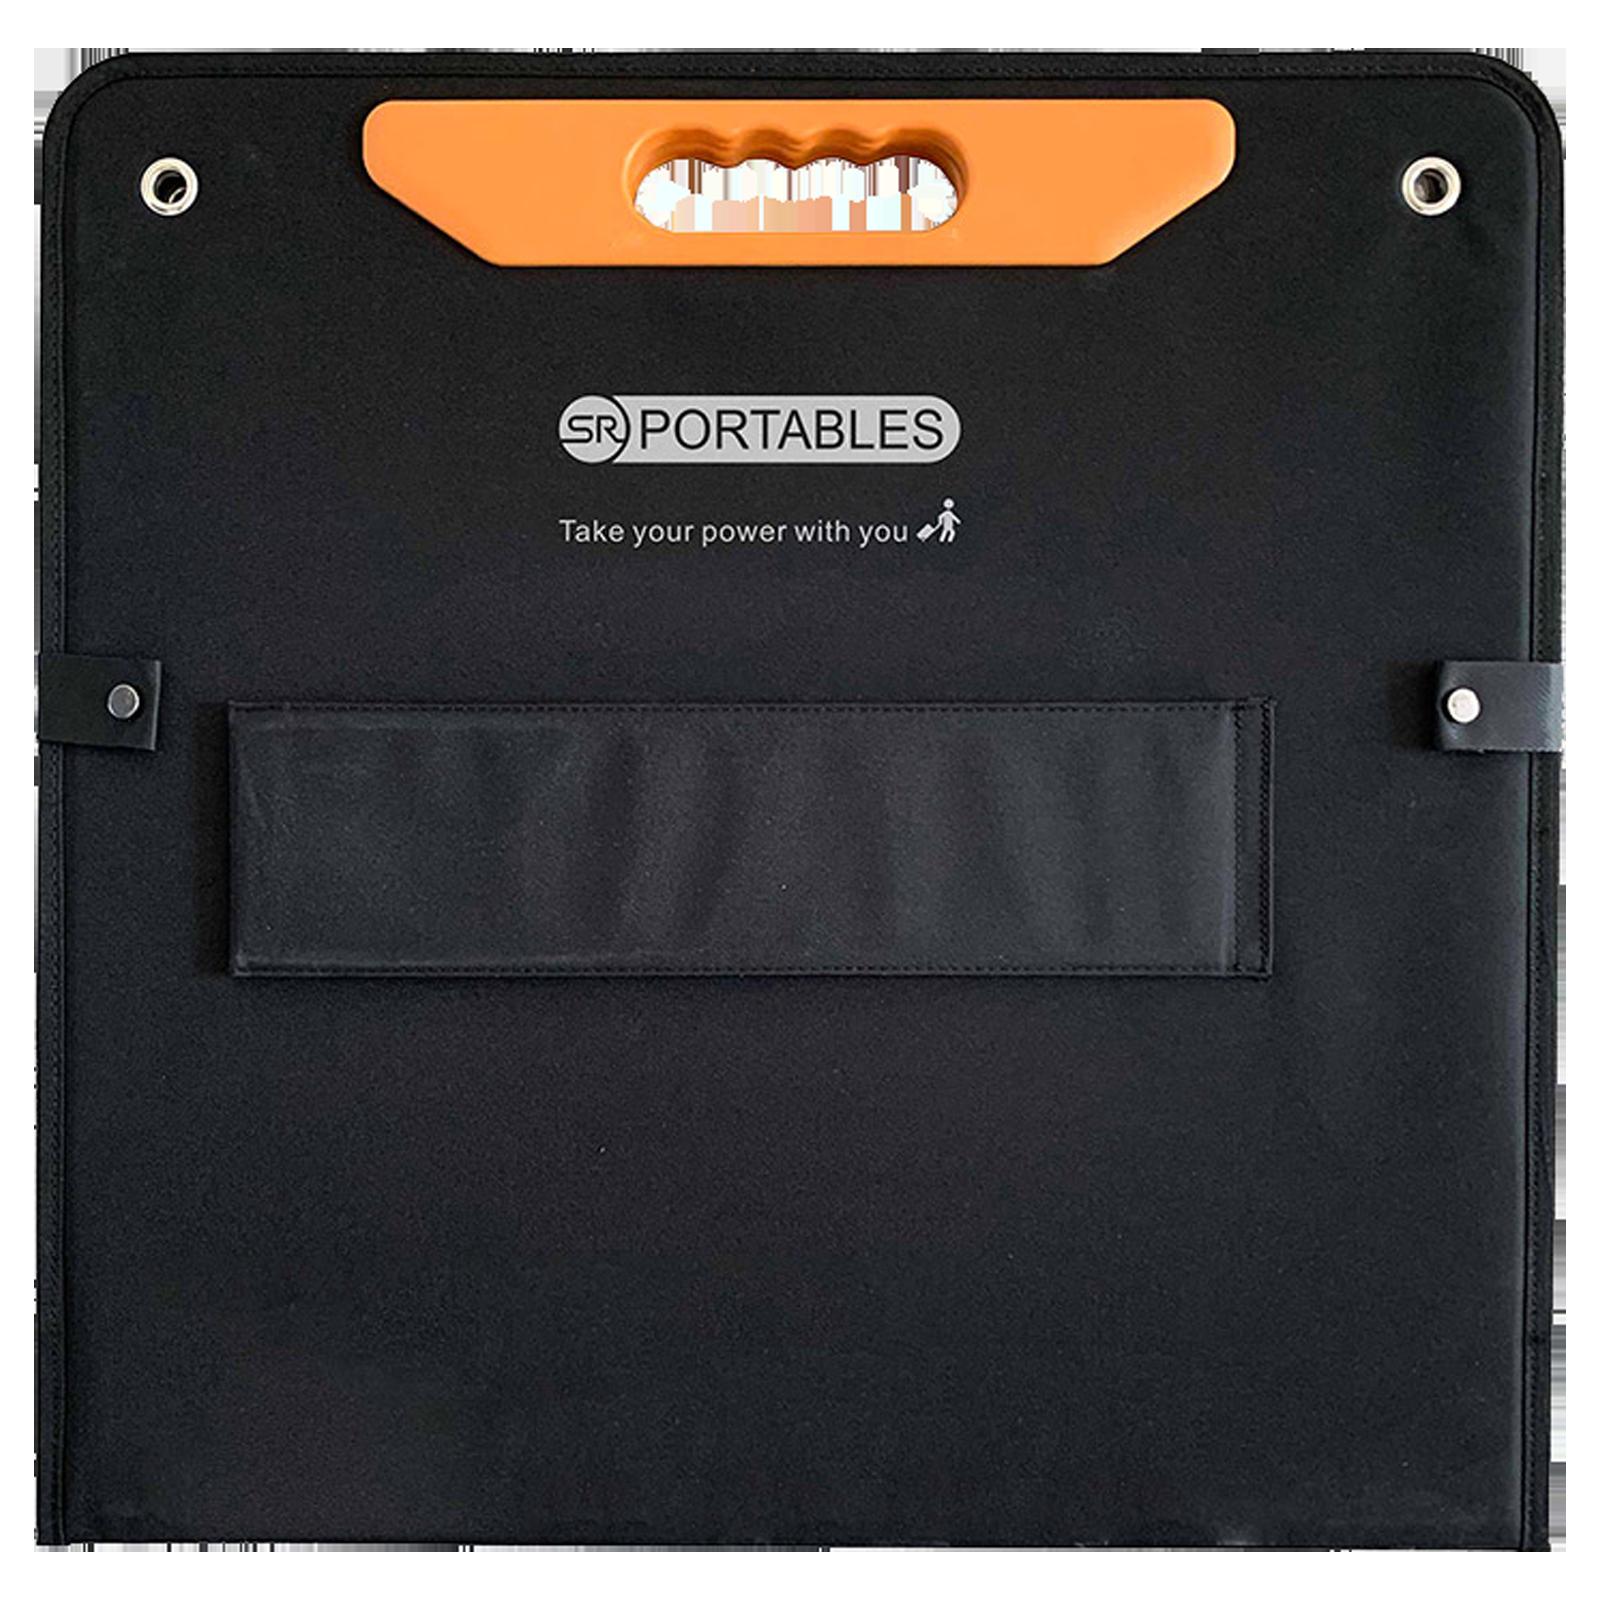 SR Portables 200 Watts Portable Solar Panel (Water Resistant, SRSOLPAN200, Black)_1